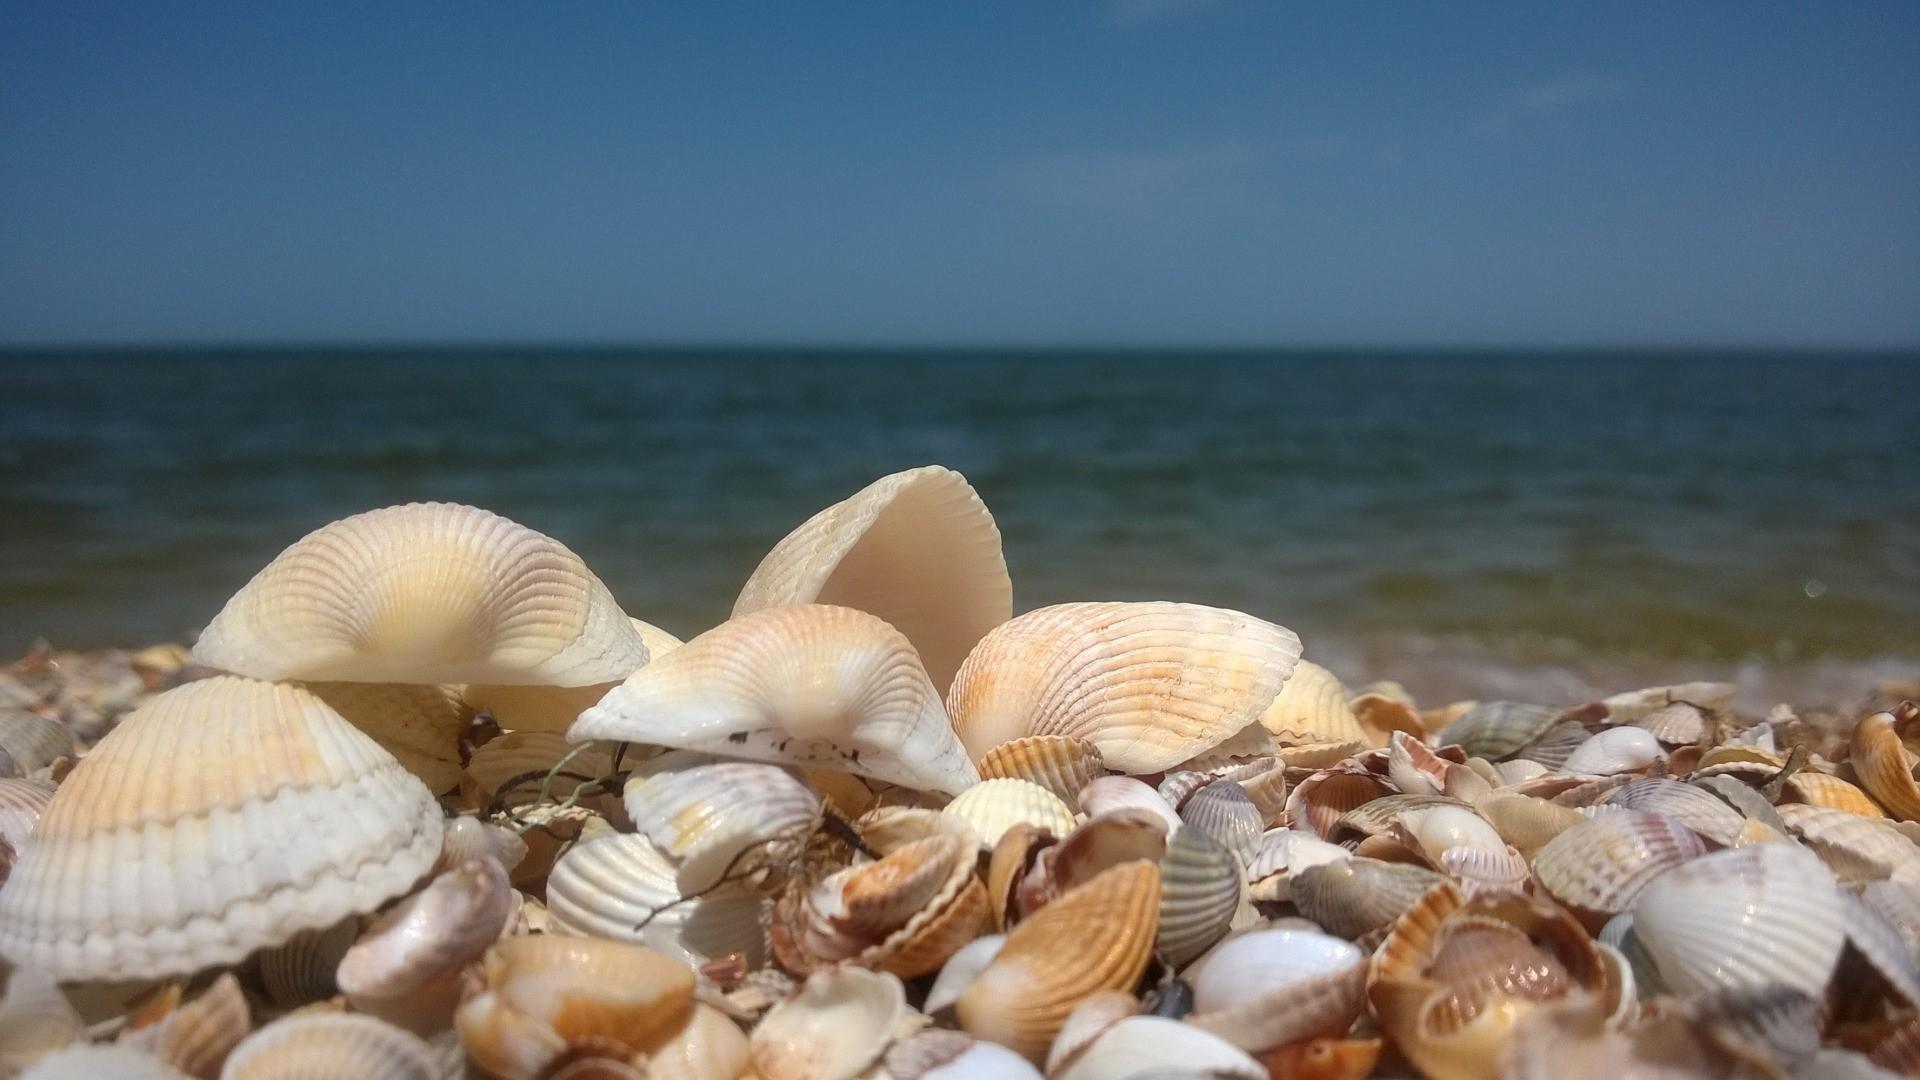 Seashell desktop wallpaper hd